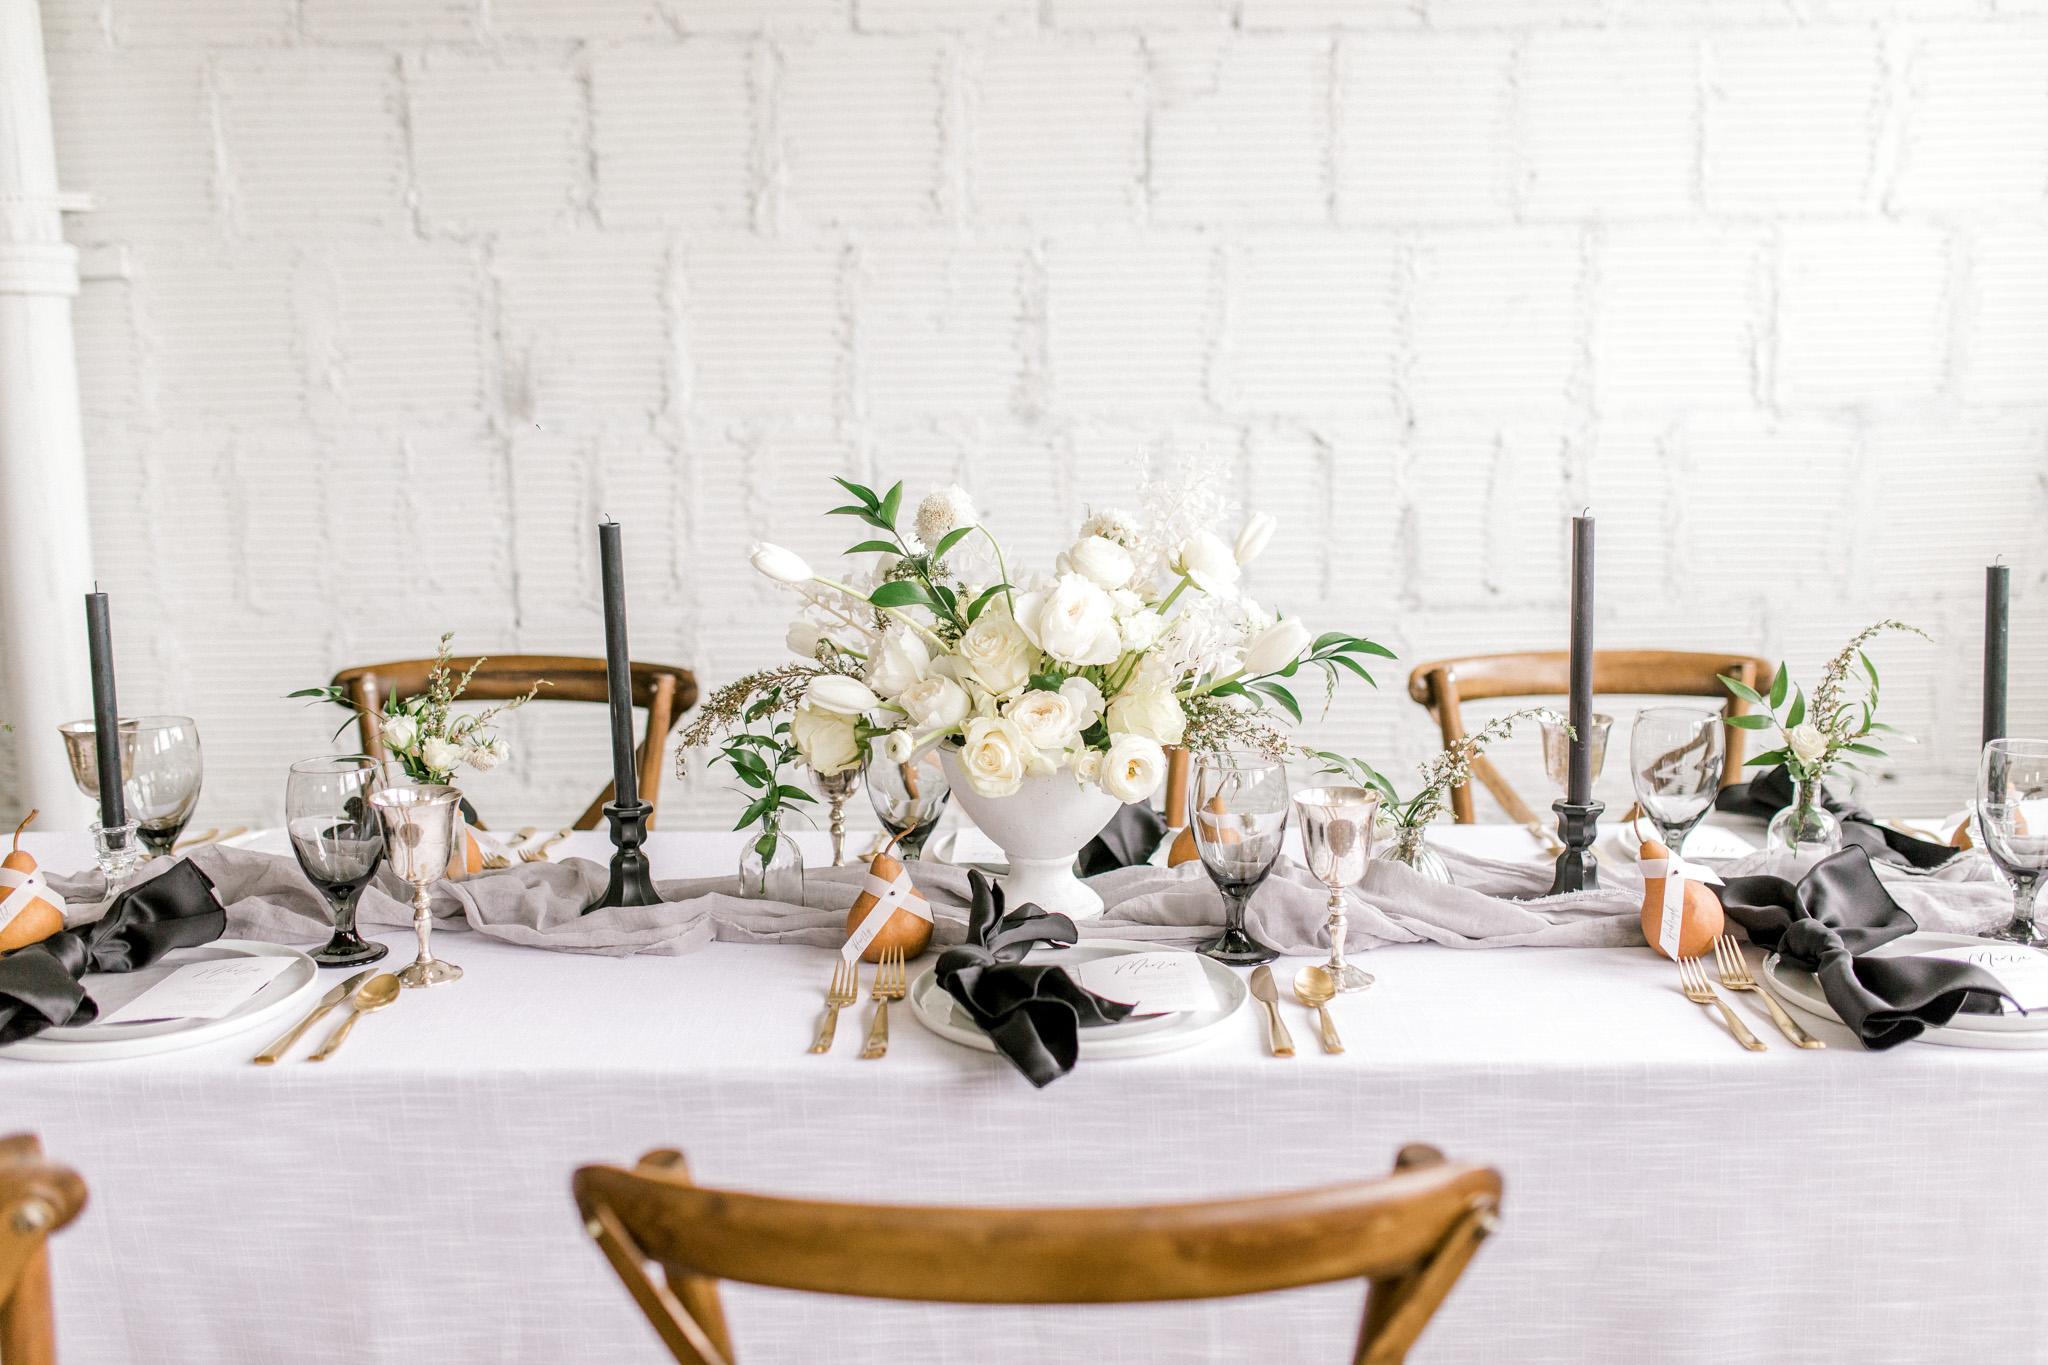 Styled Wedding Workshop | Champagne Bridesmaids Dresses | Edgy Romantic Wedding | West Michigan Wedding Photographer